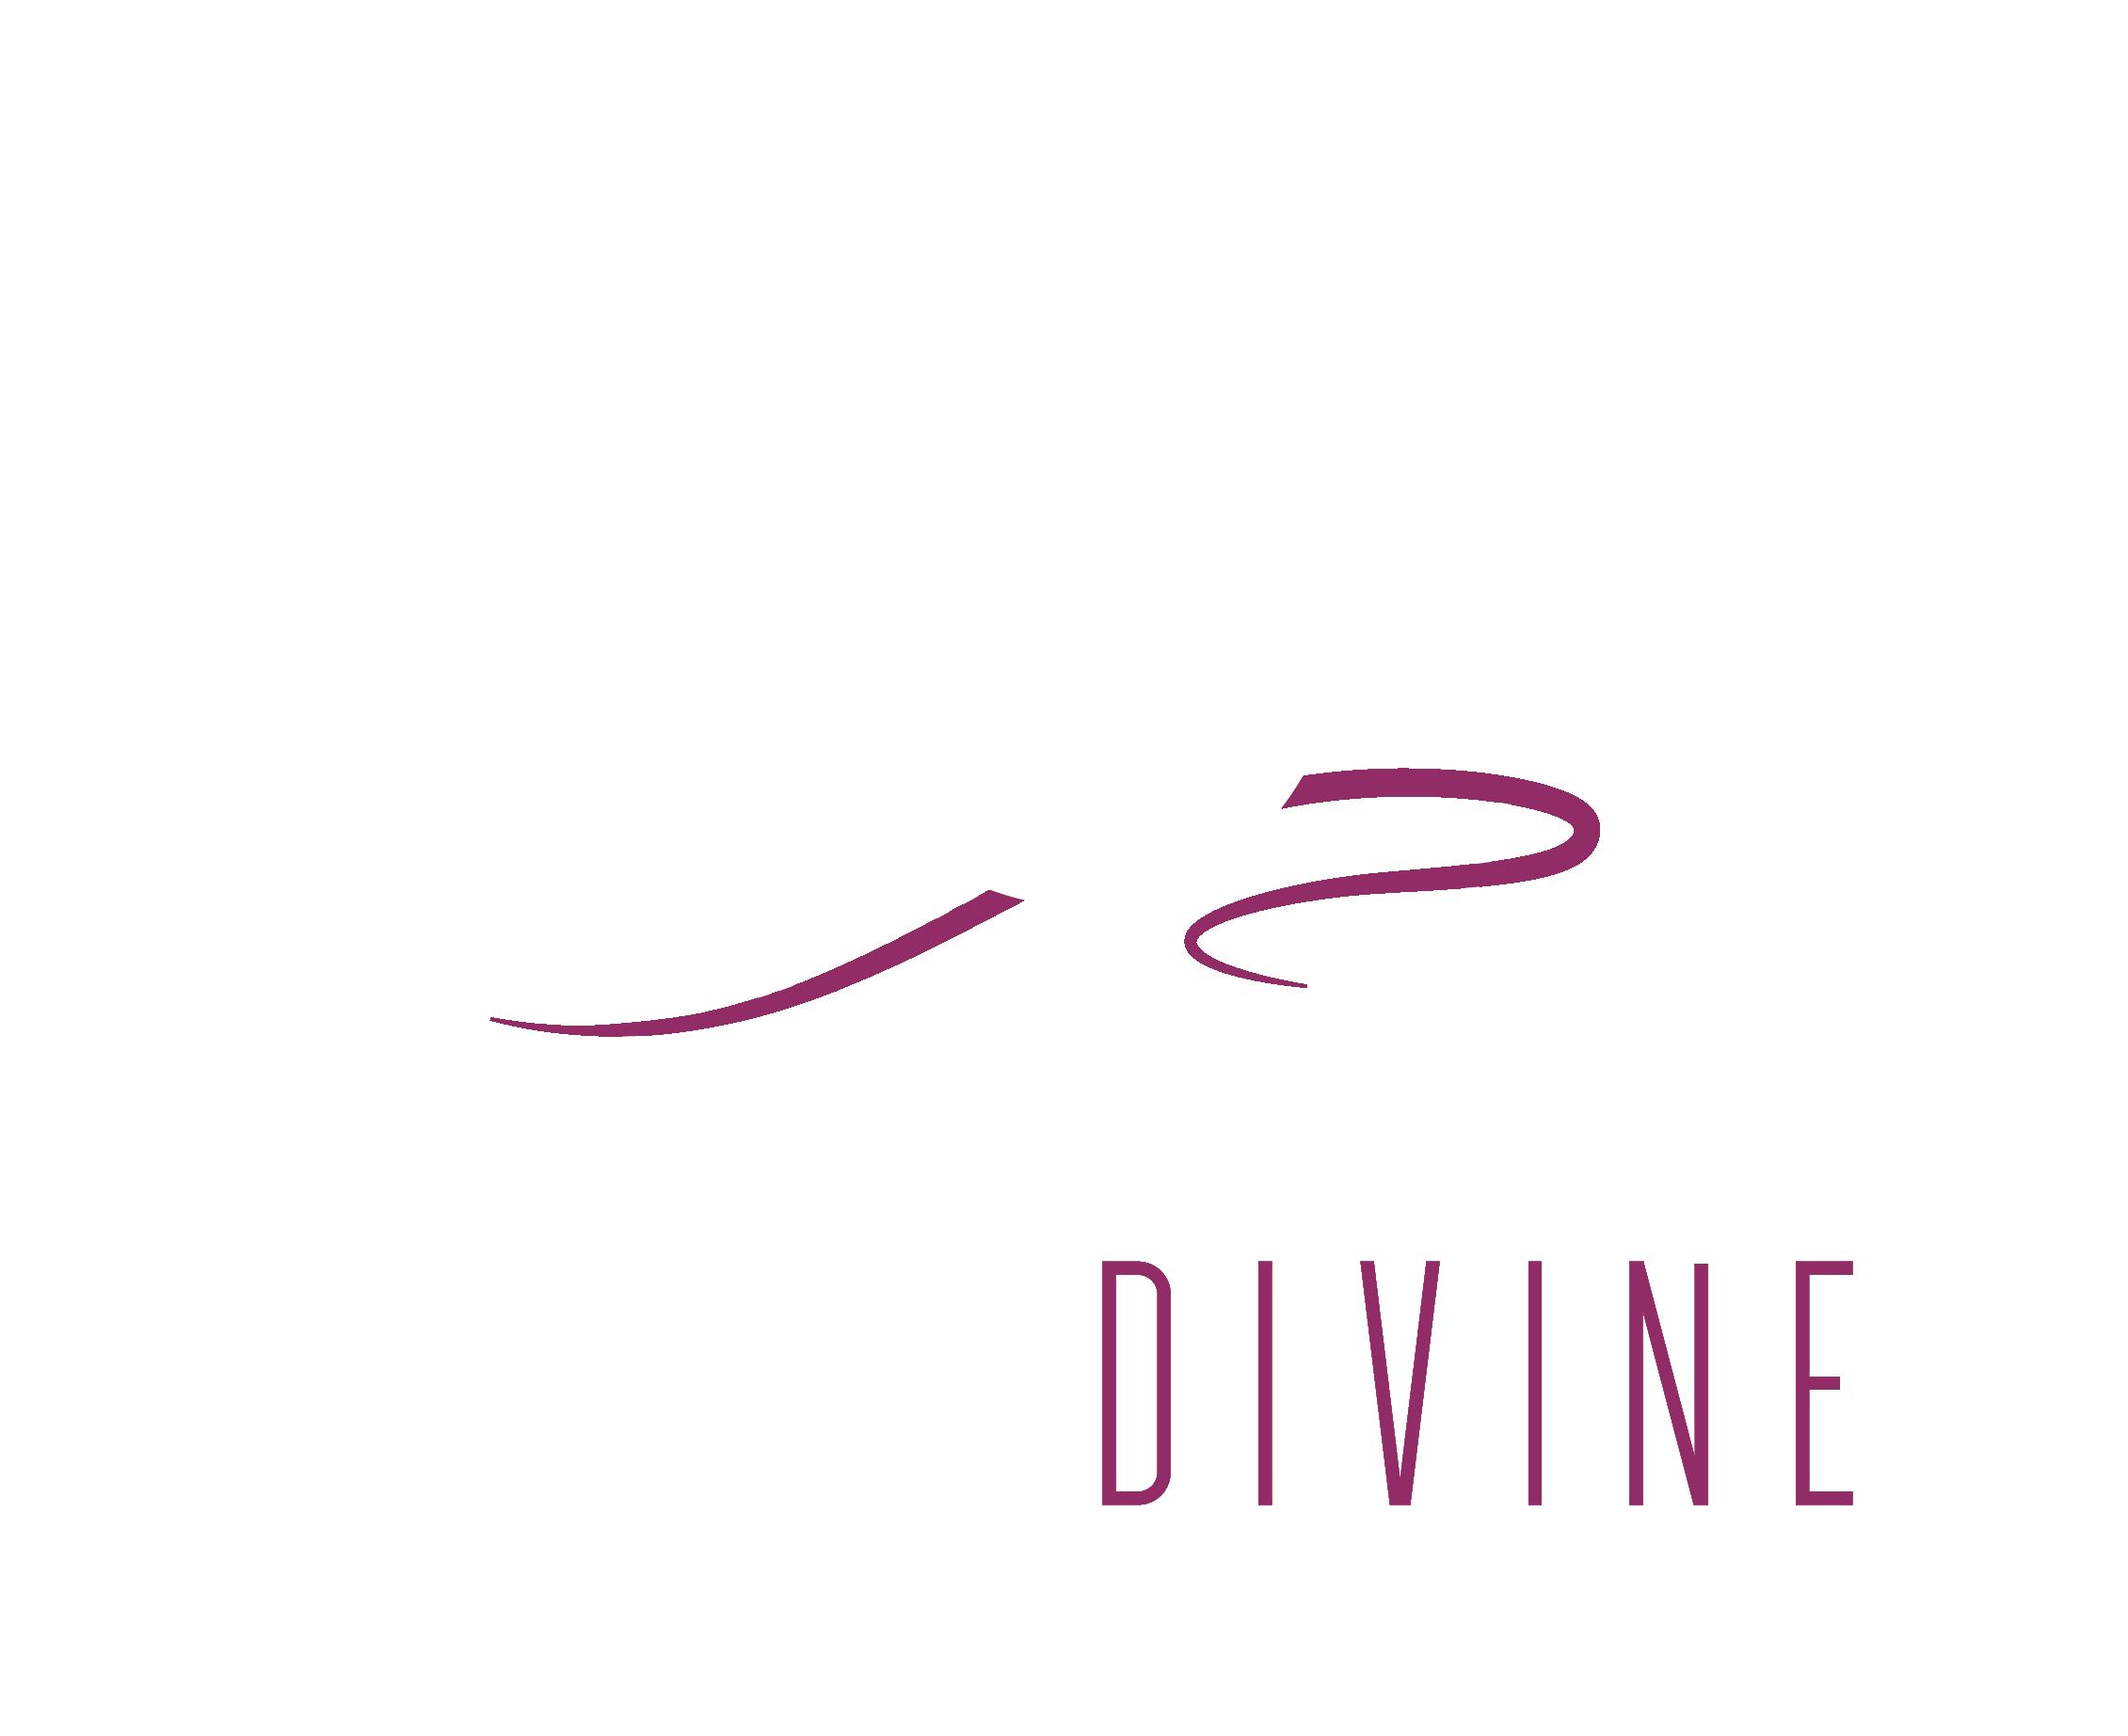 Notti Divine